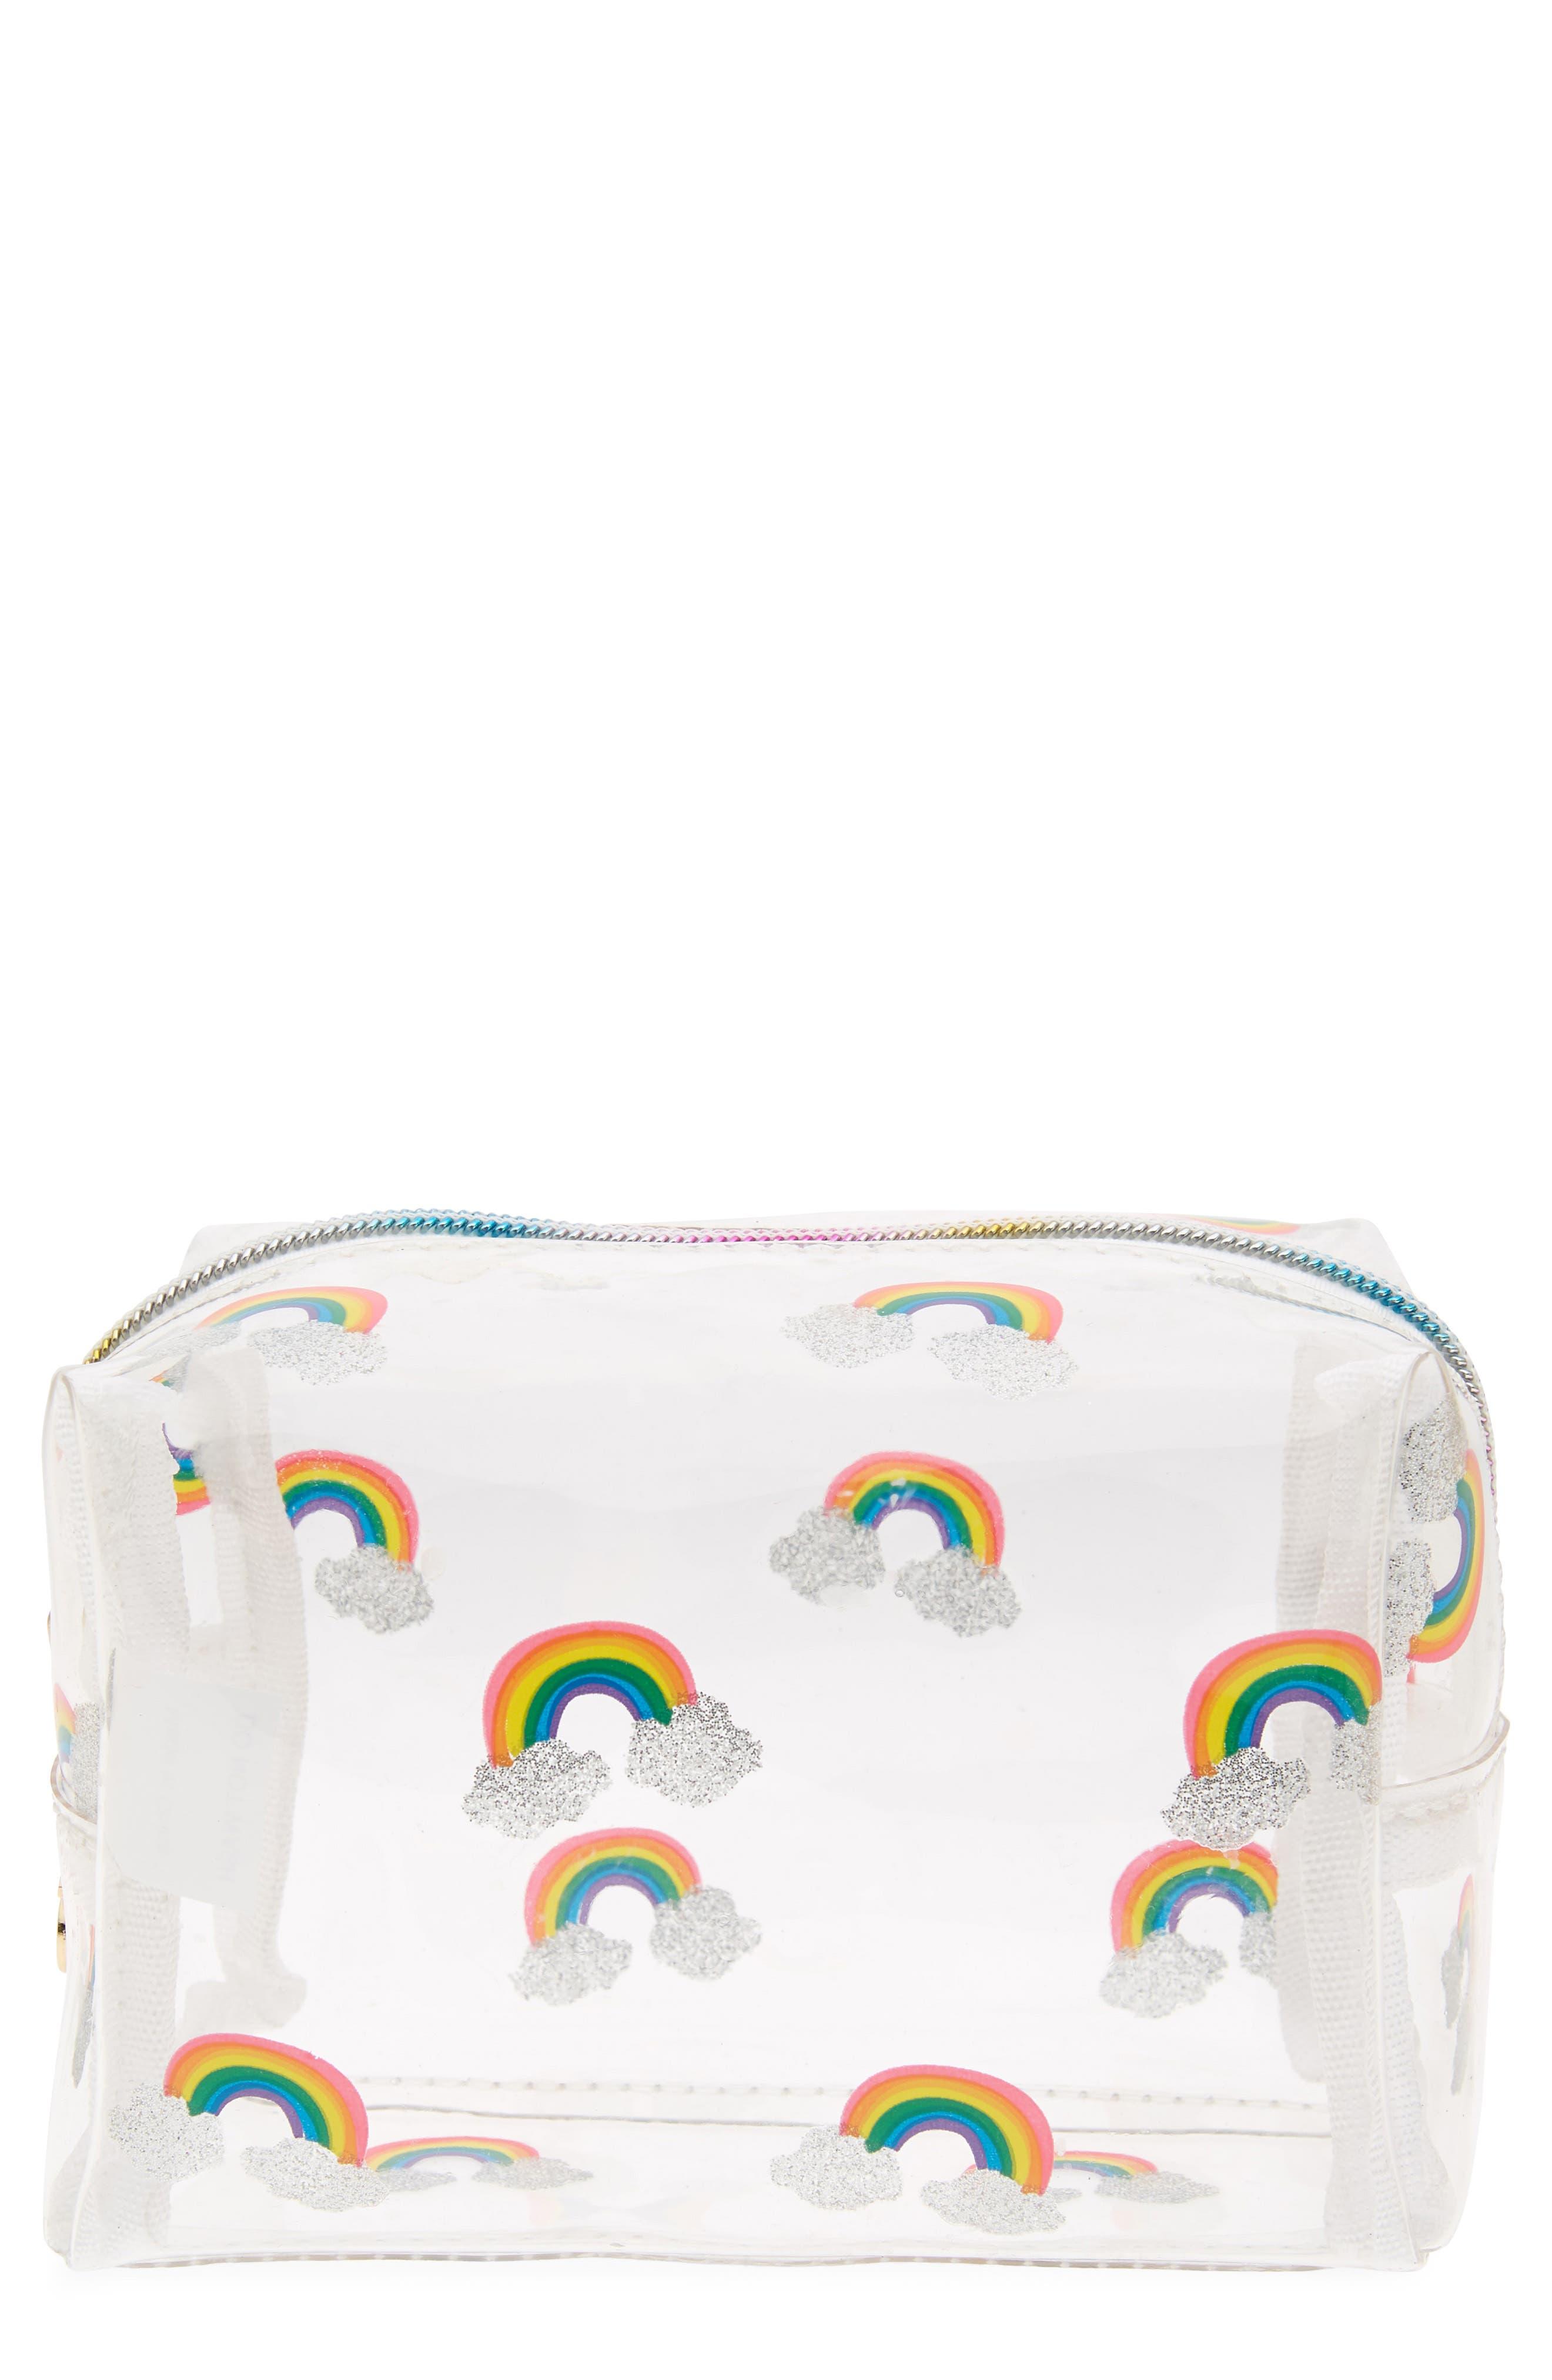 Rainbow Cosmetics Bag,                             Main thumbnail 1, color,                             100